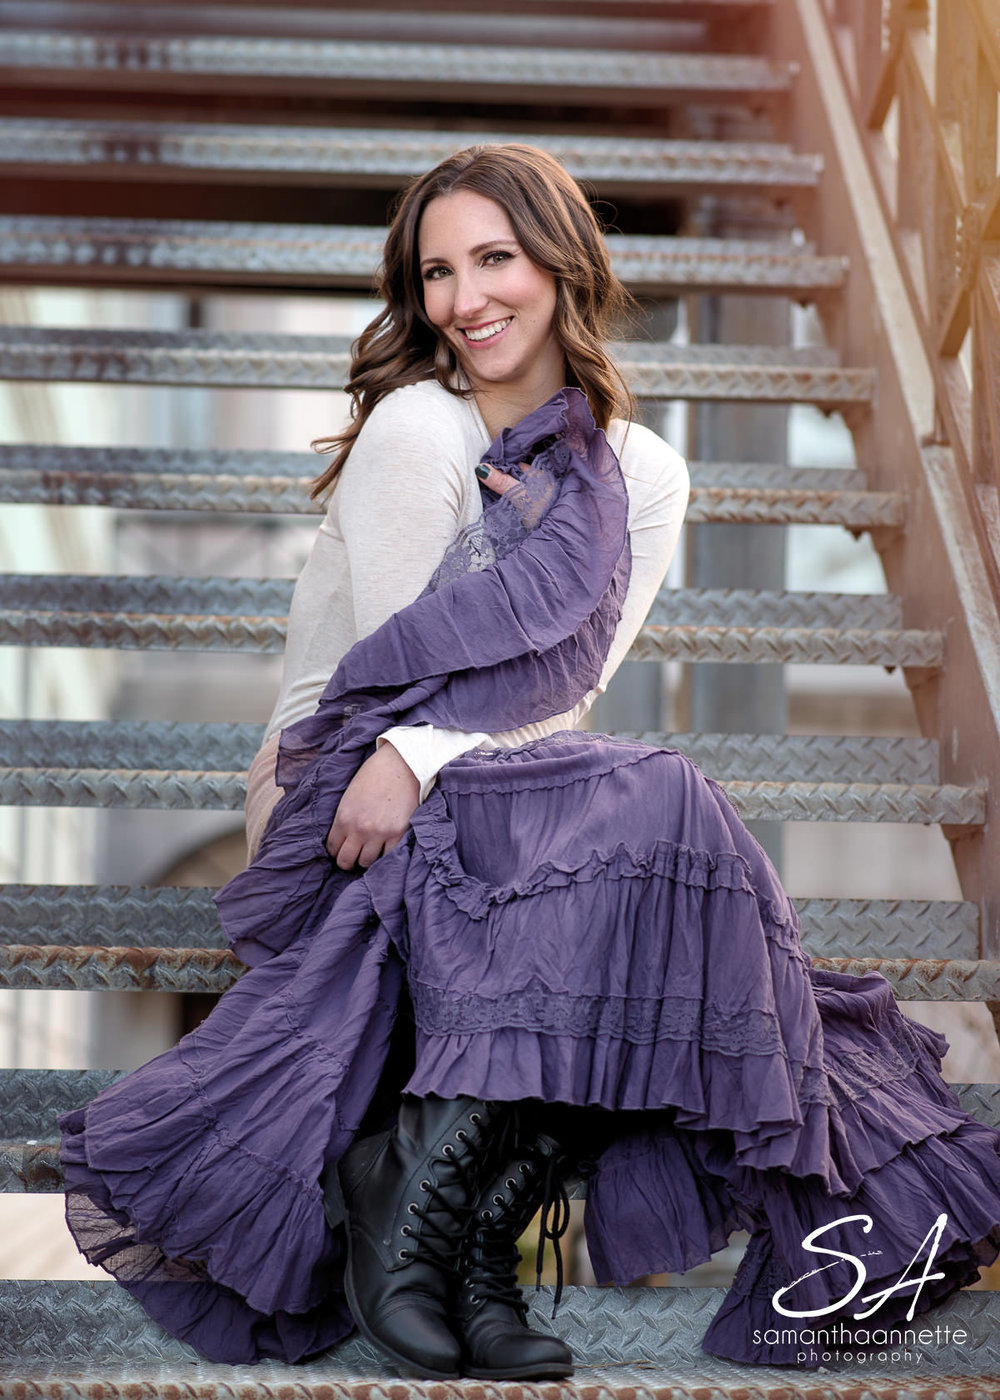 Jodi - Samantha Annette Photography 3.JPG